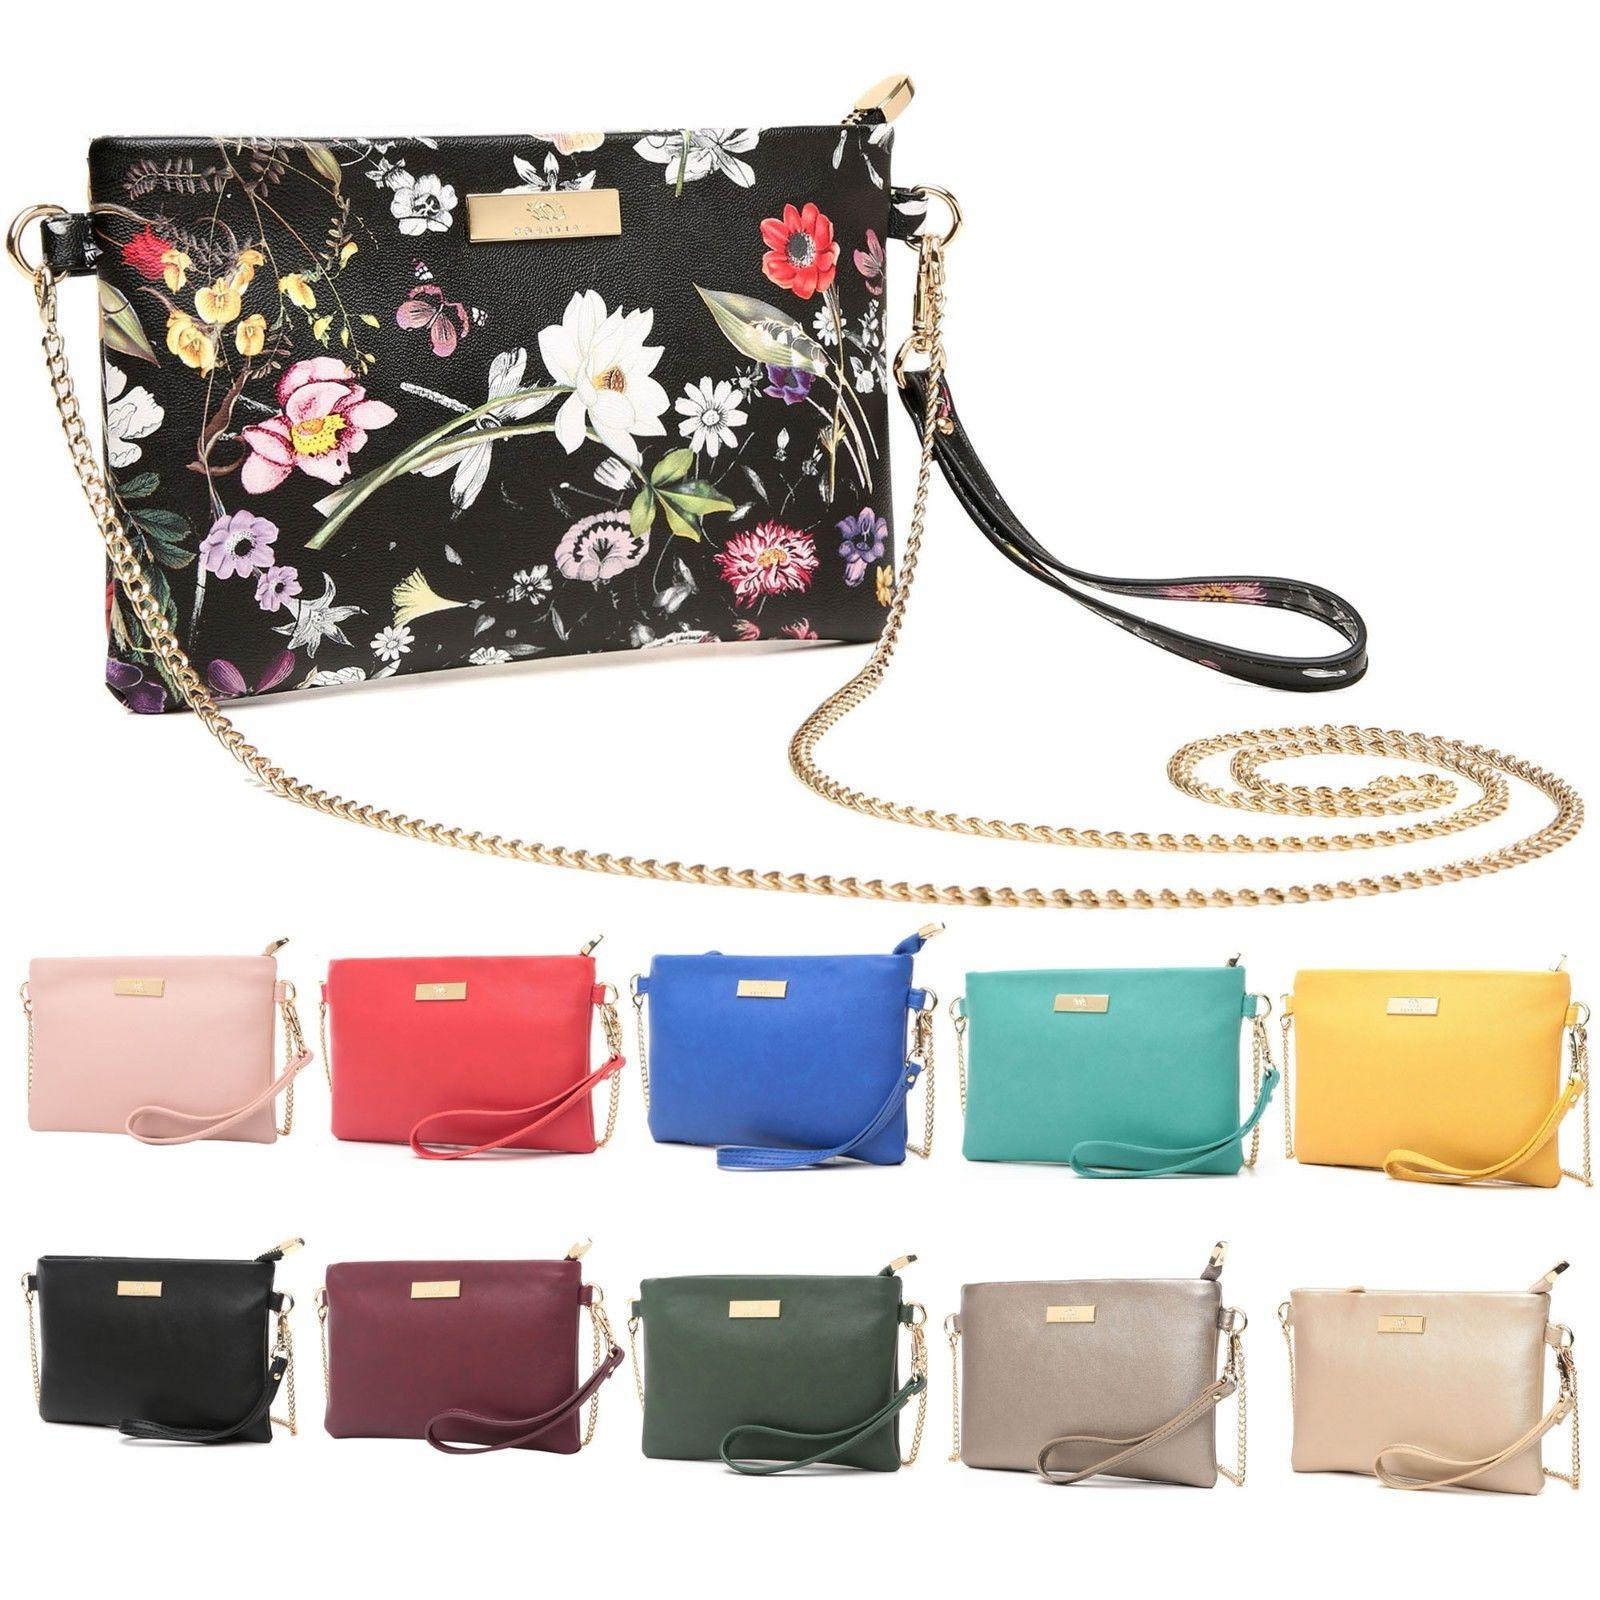 Aitbags Fashion Phone Purse Bag